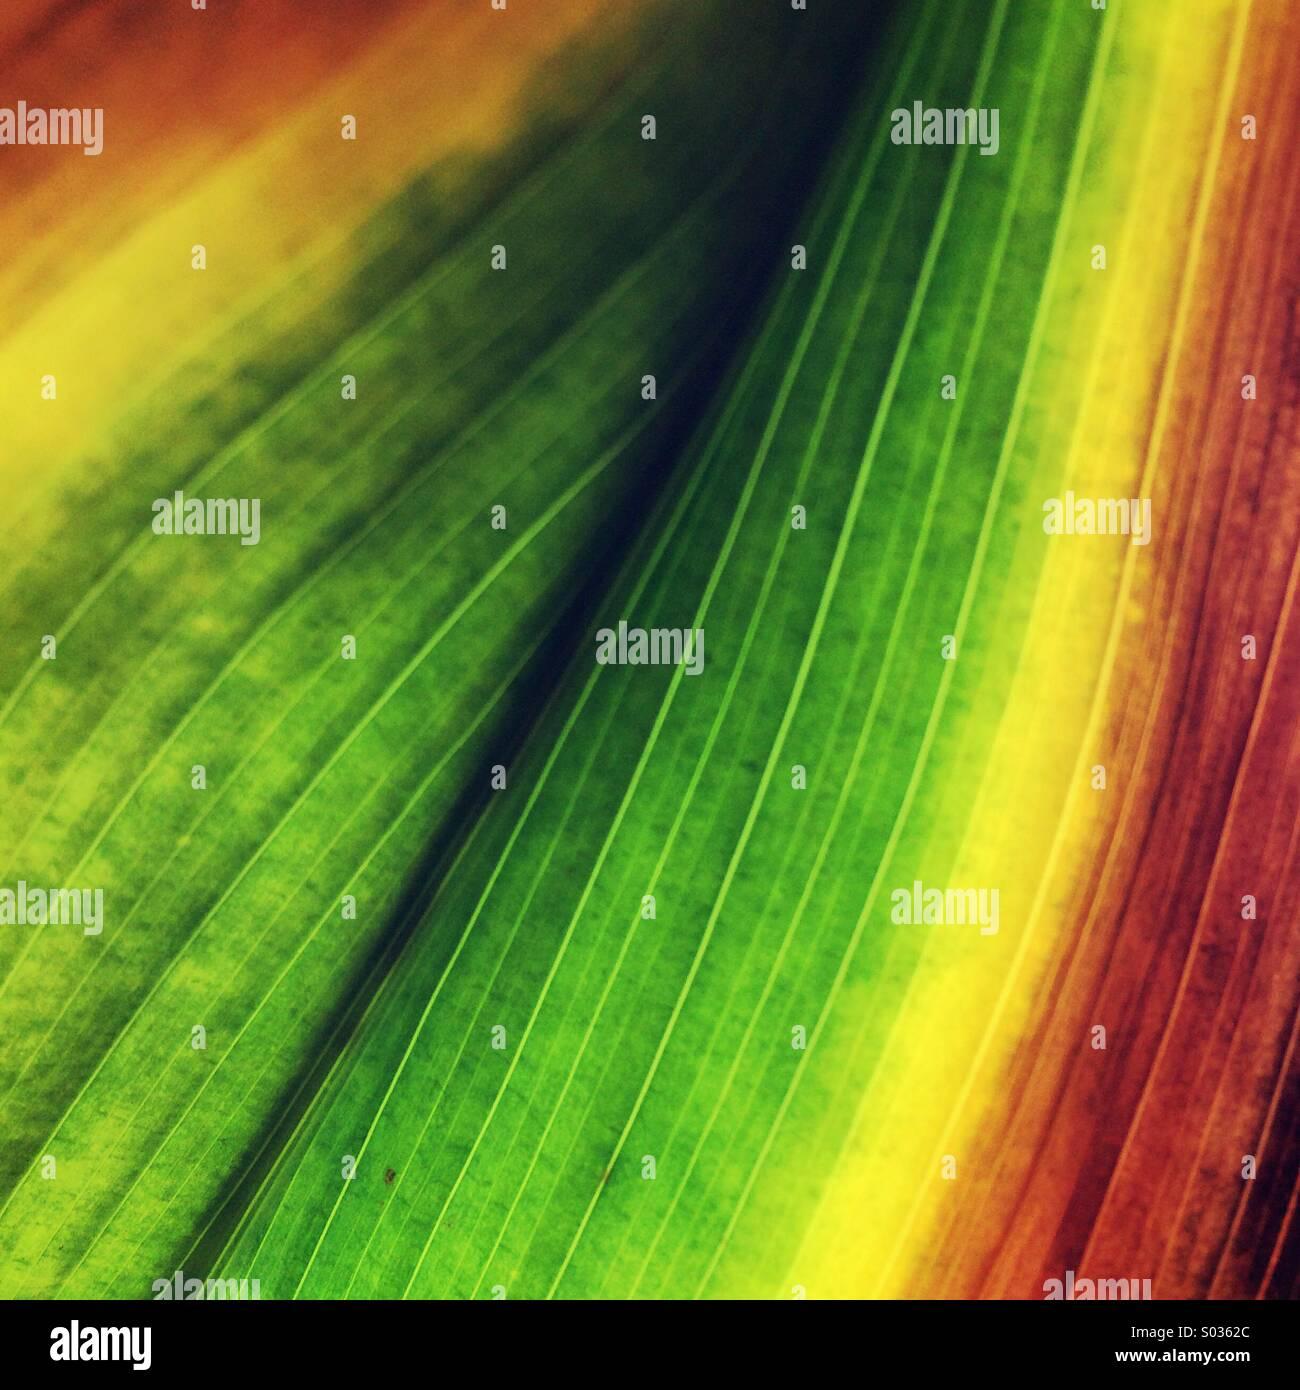 Green & orange leaf - Stock Image